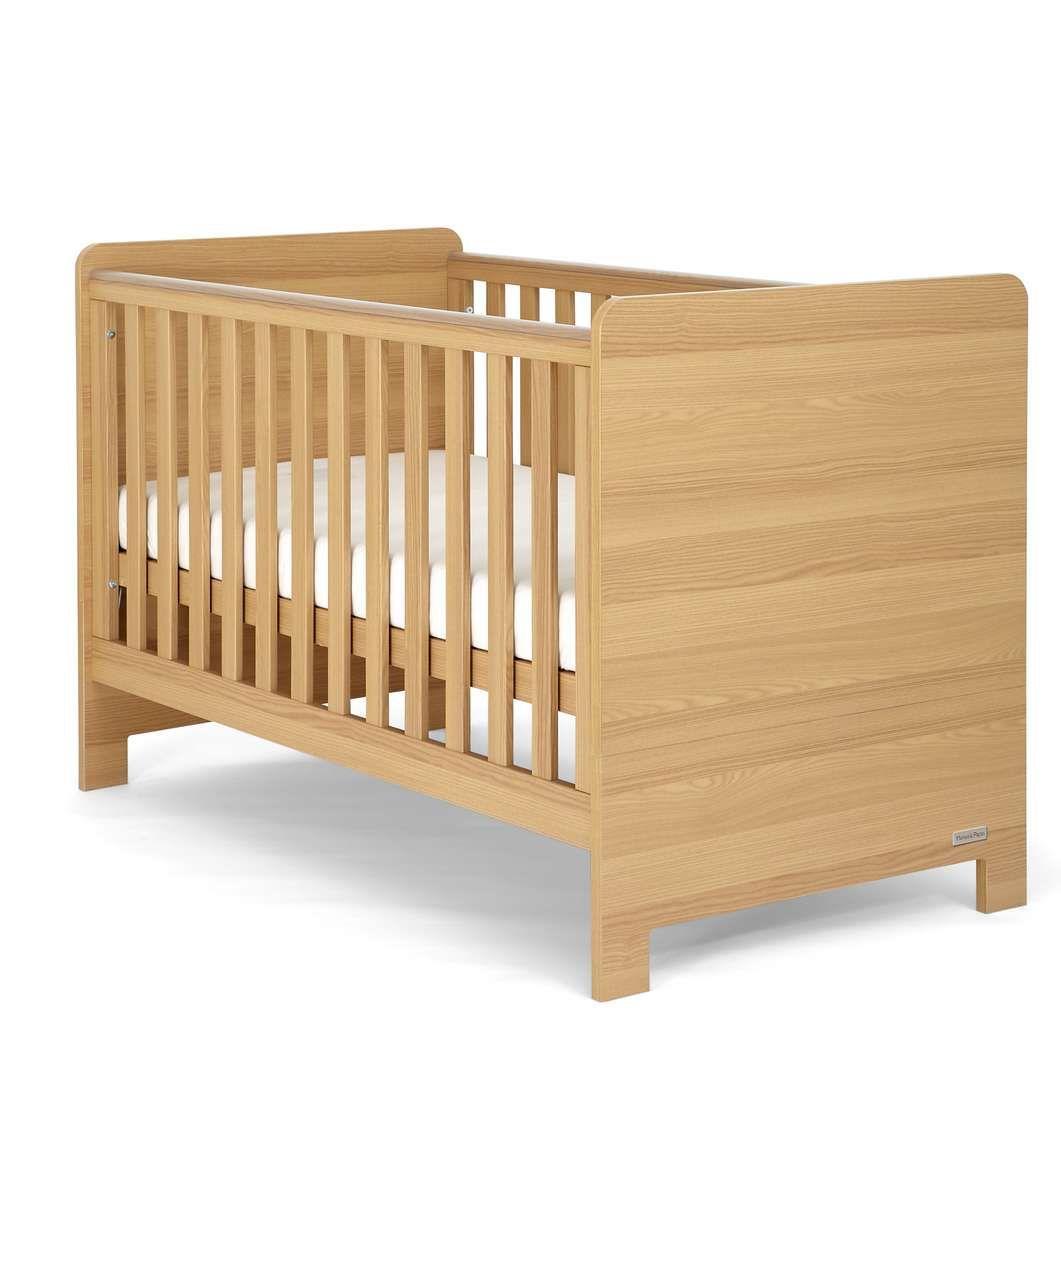 Mamas And Papas Bedroom Furniture Haxby Cot Toddler Bed Oak Cot Beds Cots Cribs Mamas